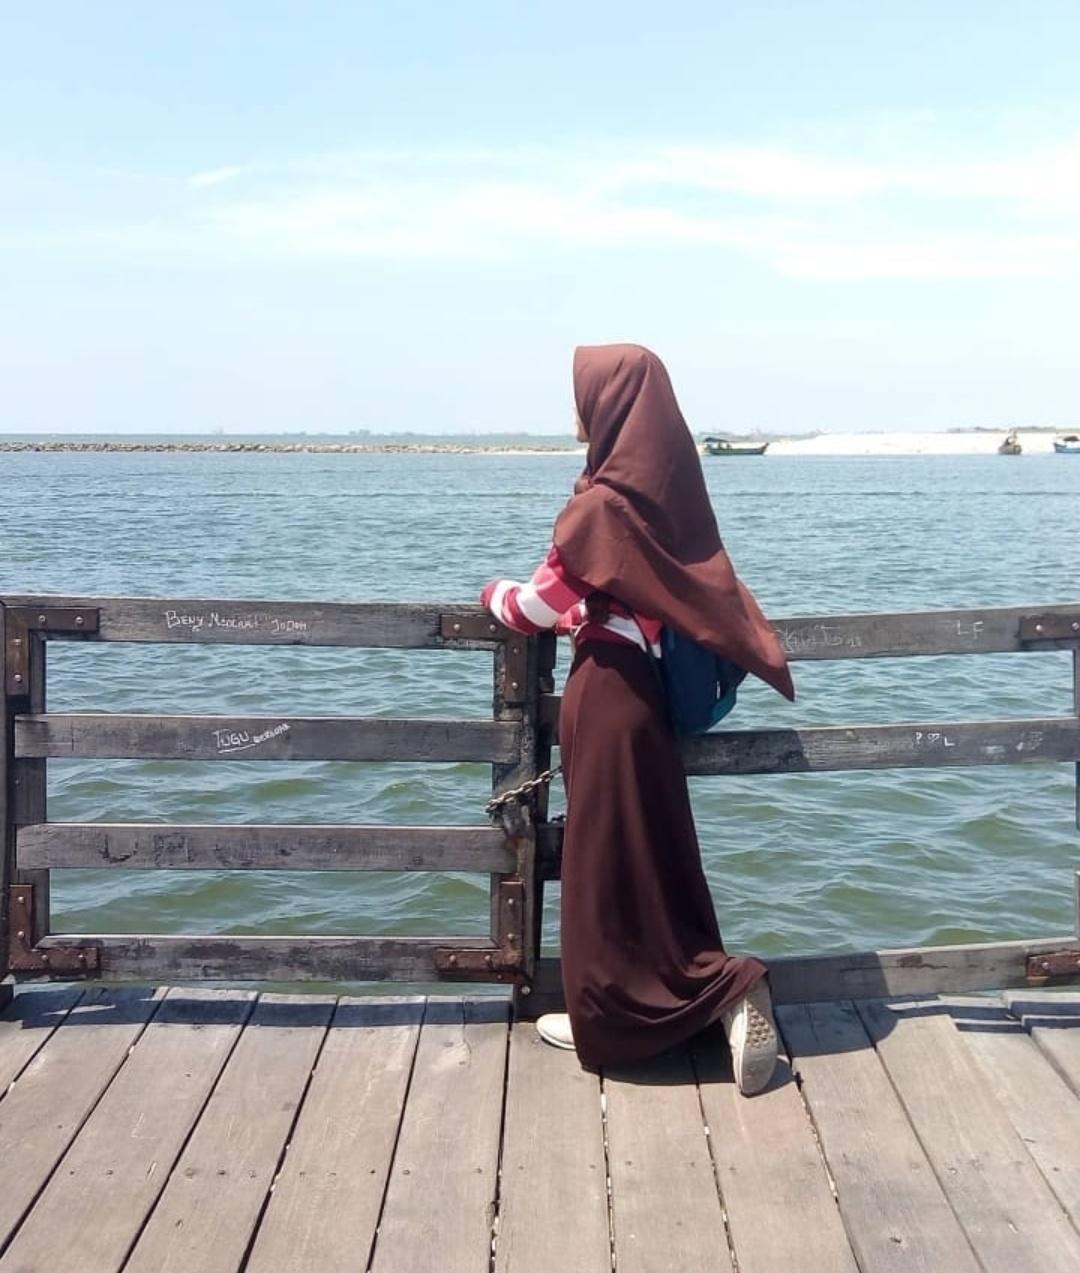 Harga Tiket Masuk Kawasan Wisata Pantai Ancol Dan Pantai